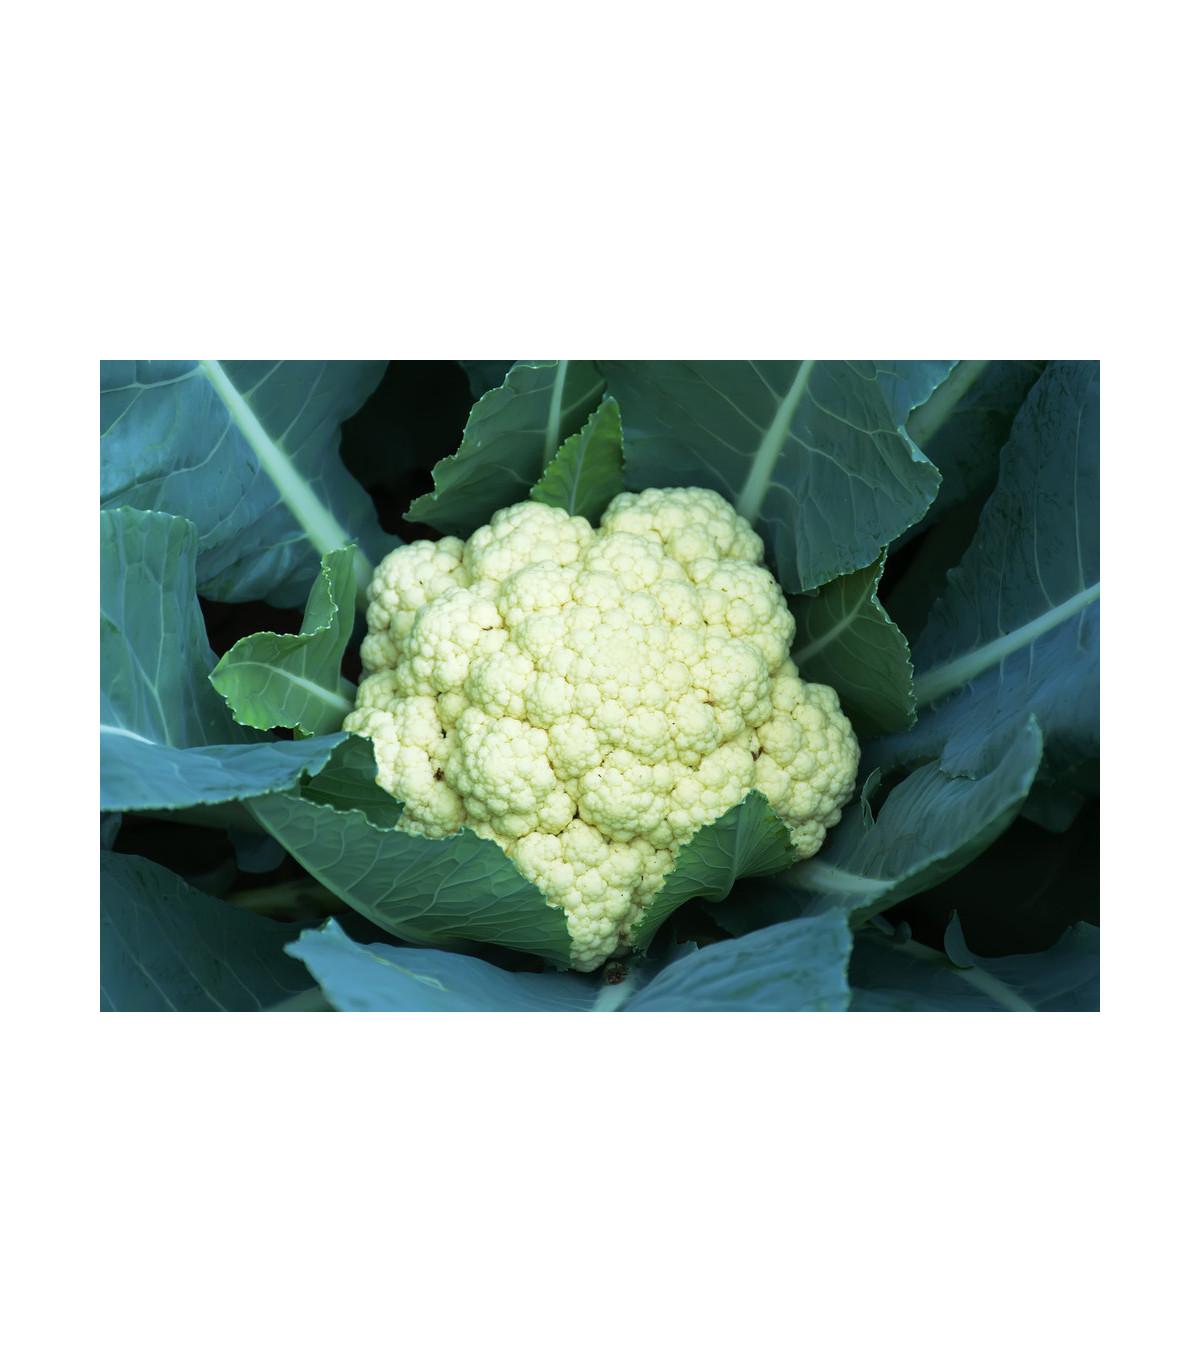 Karfiol neskorý Romanesco - Brassica oleracea botrytis - semená karfiolu - 20 ks